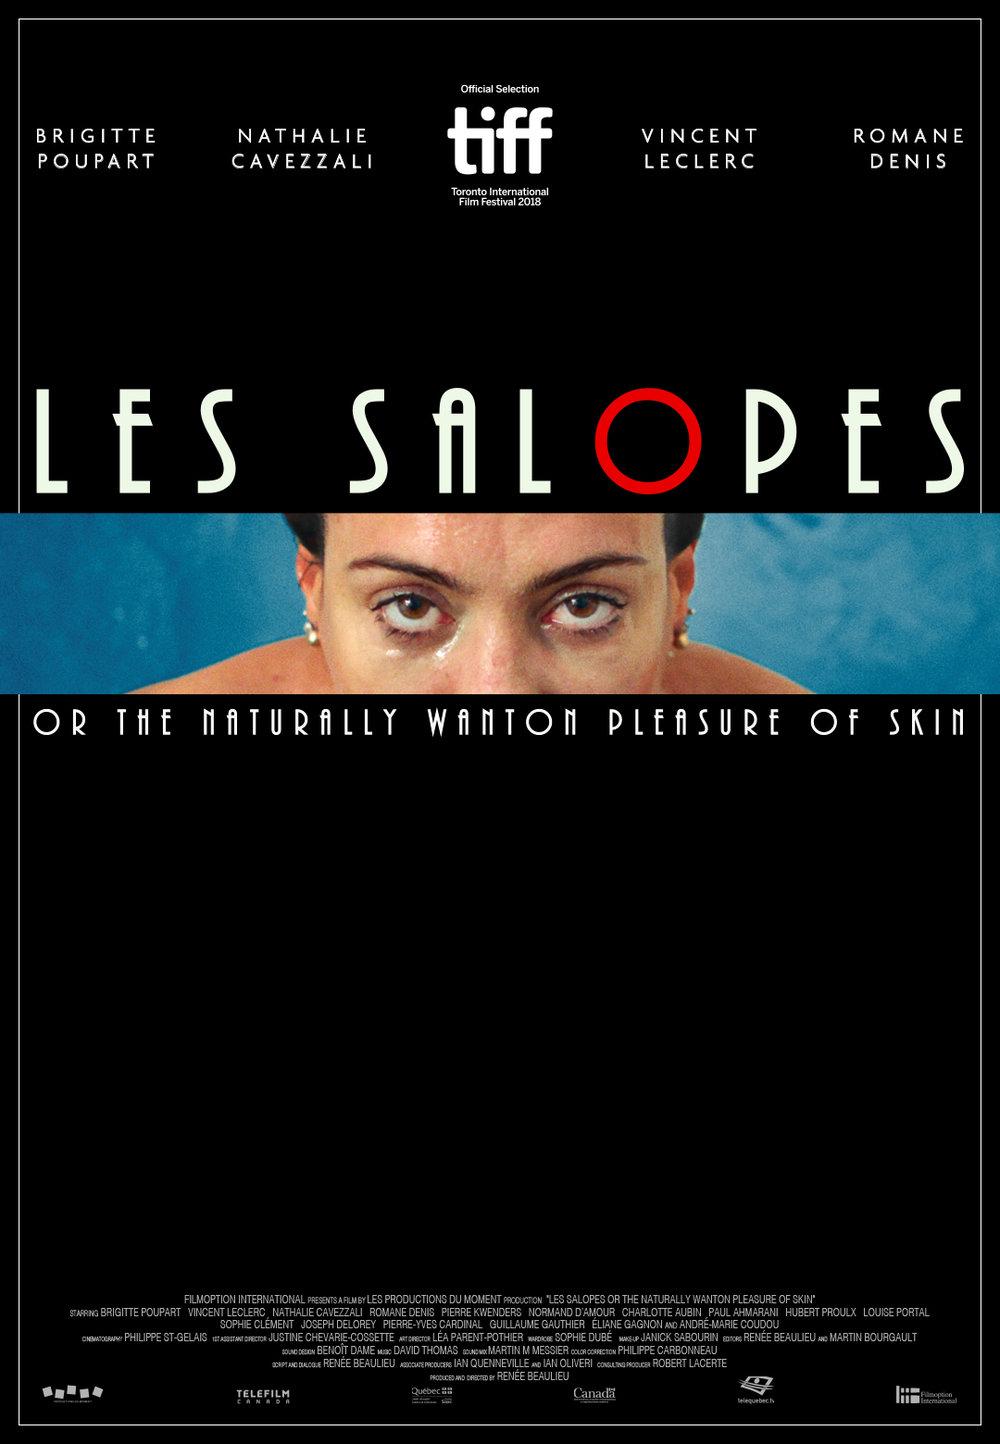 Les Salopes - Poster ENG.jpg